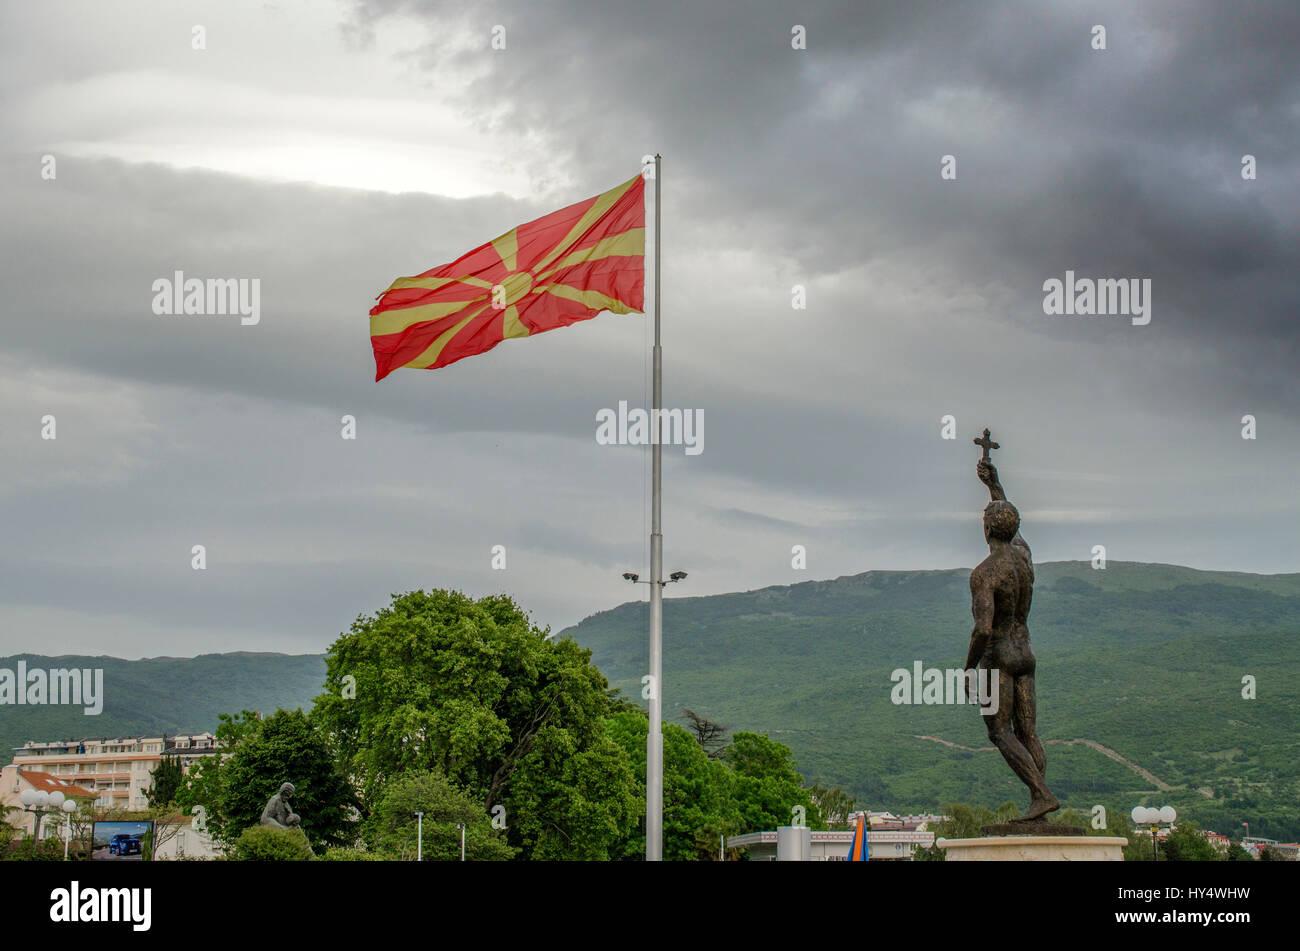 Macedonian flag with monument 'Epiphany' in Ohrid, Macedonia - Stock Image